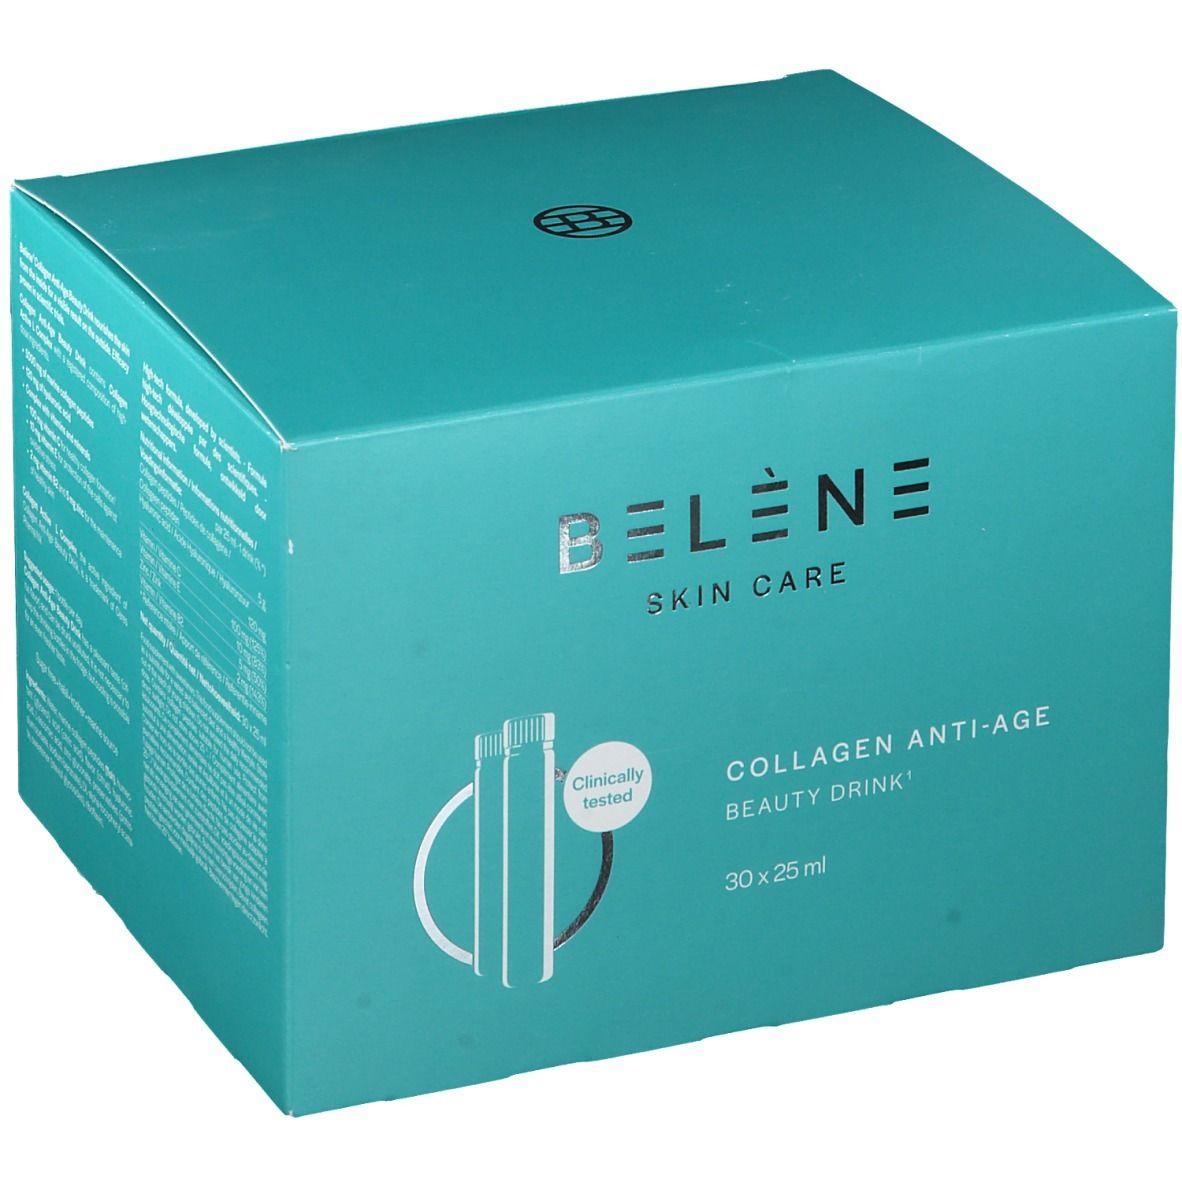 Image of Belène Collagen Anti-Aging Beauty Drink